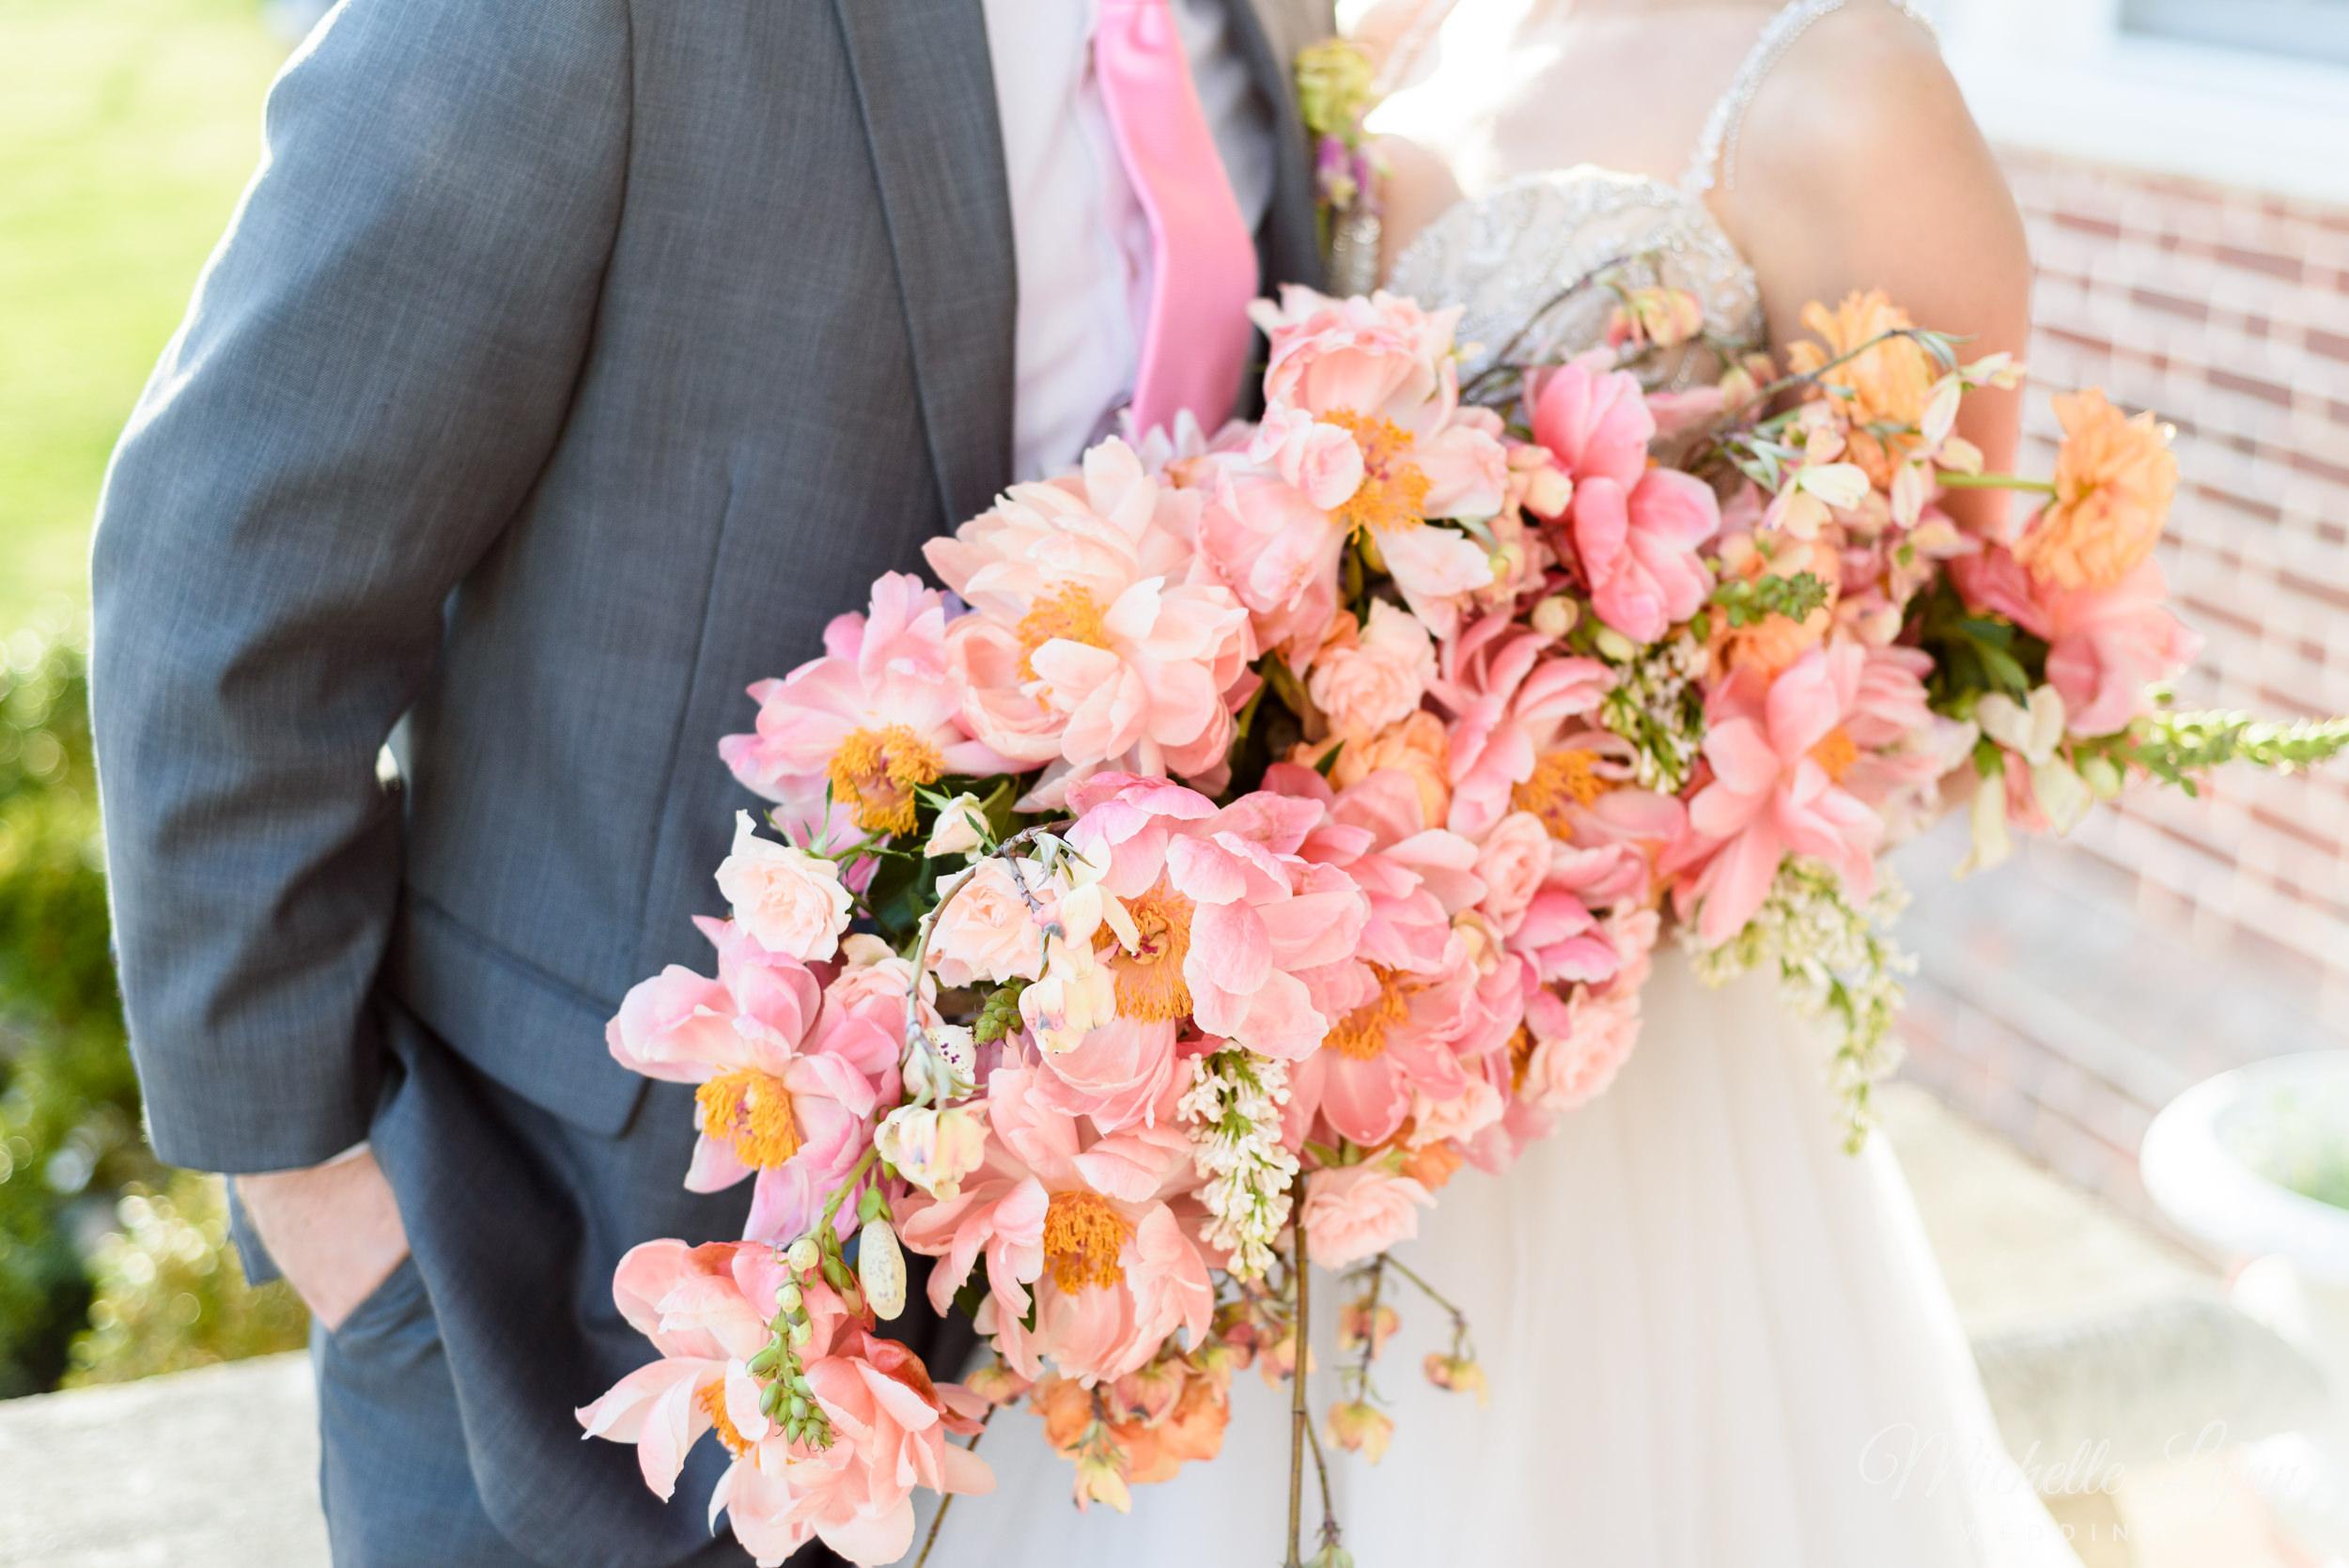 mlw-whitehall-annapolis-maryland-wedding-11.jpg